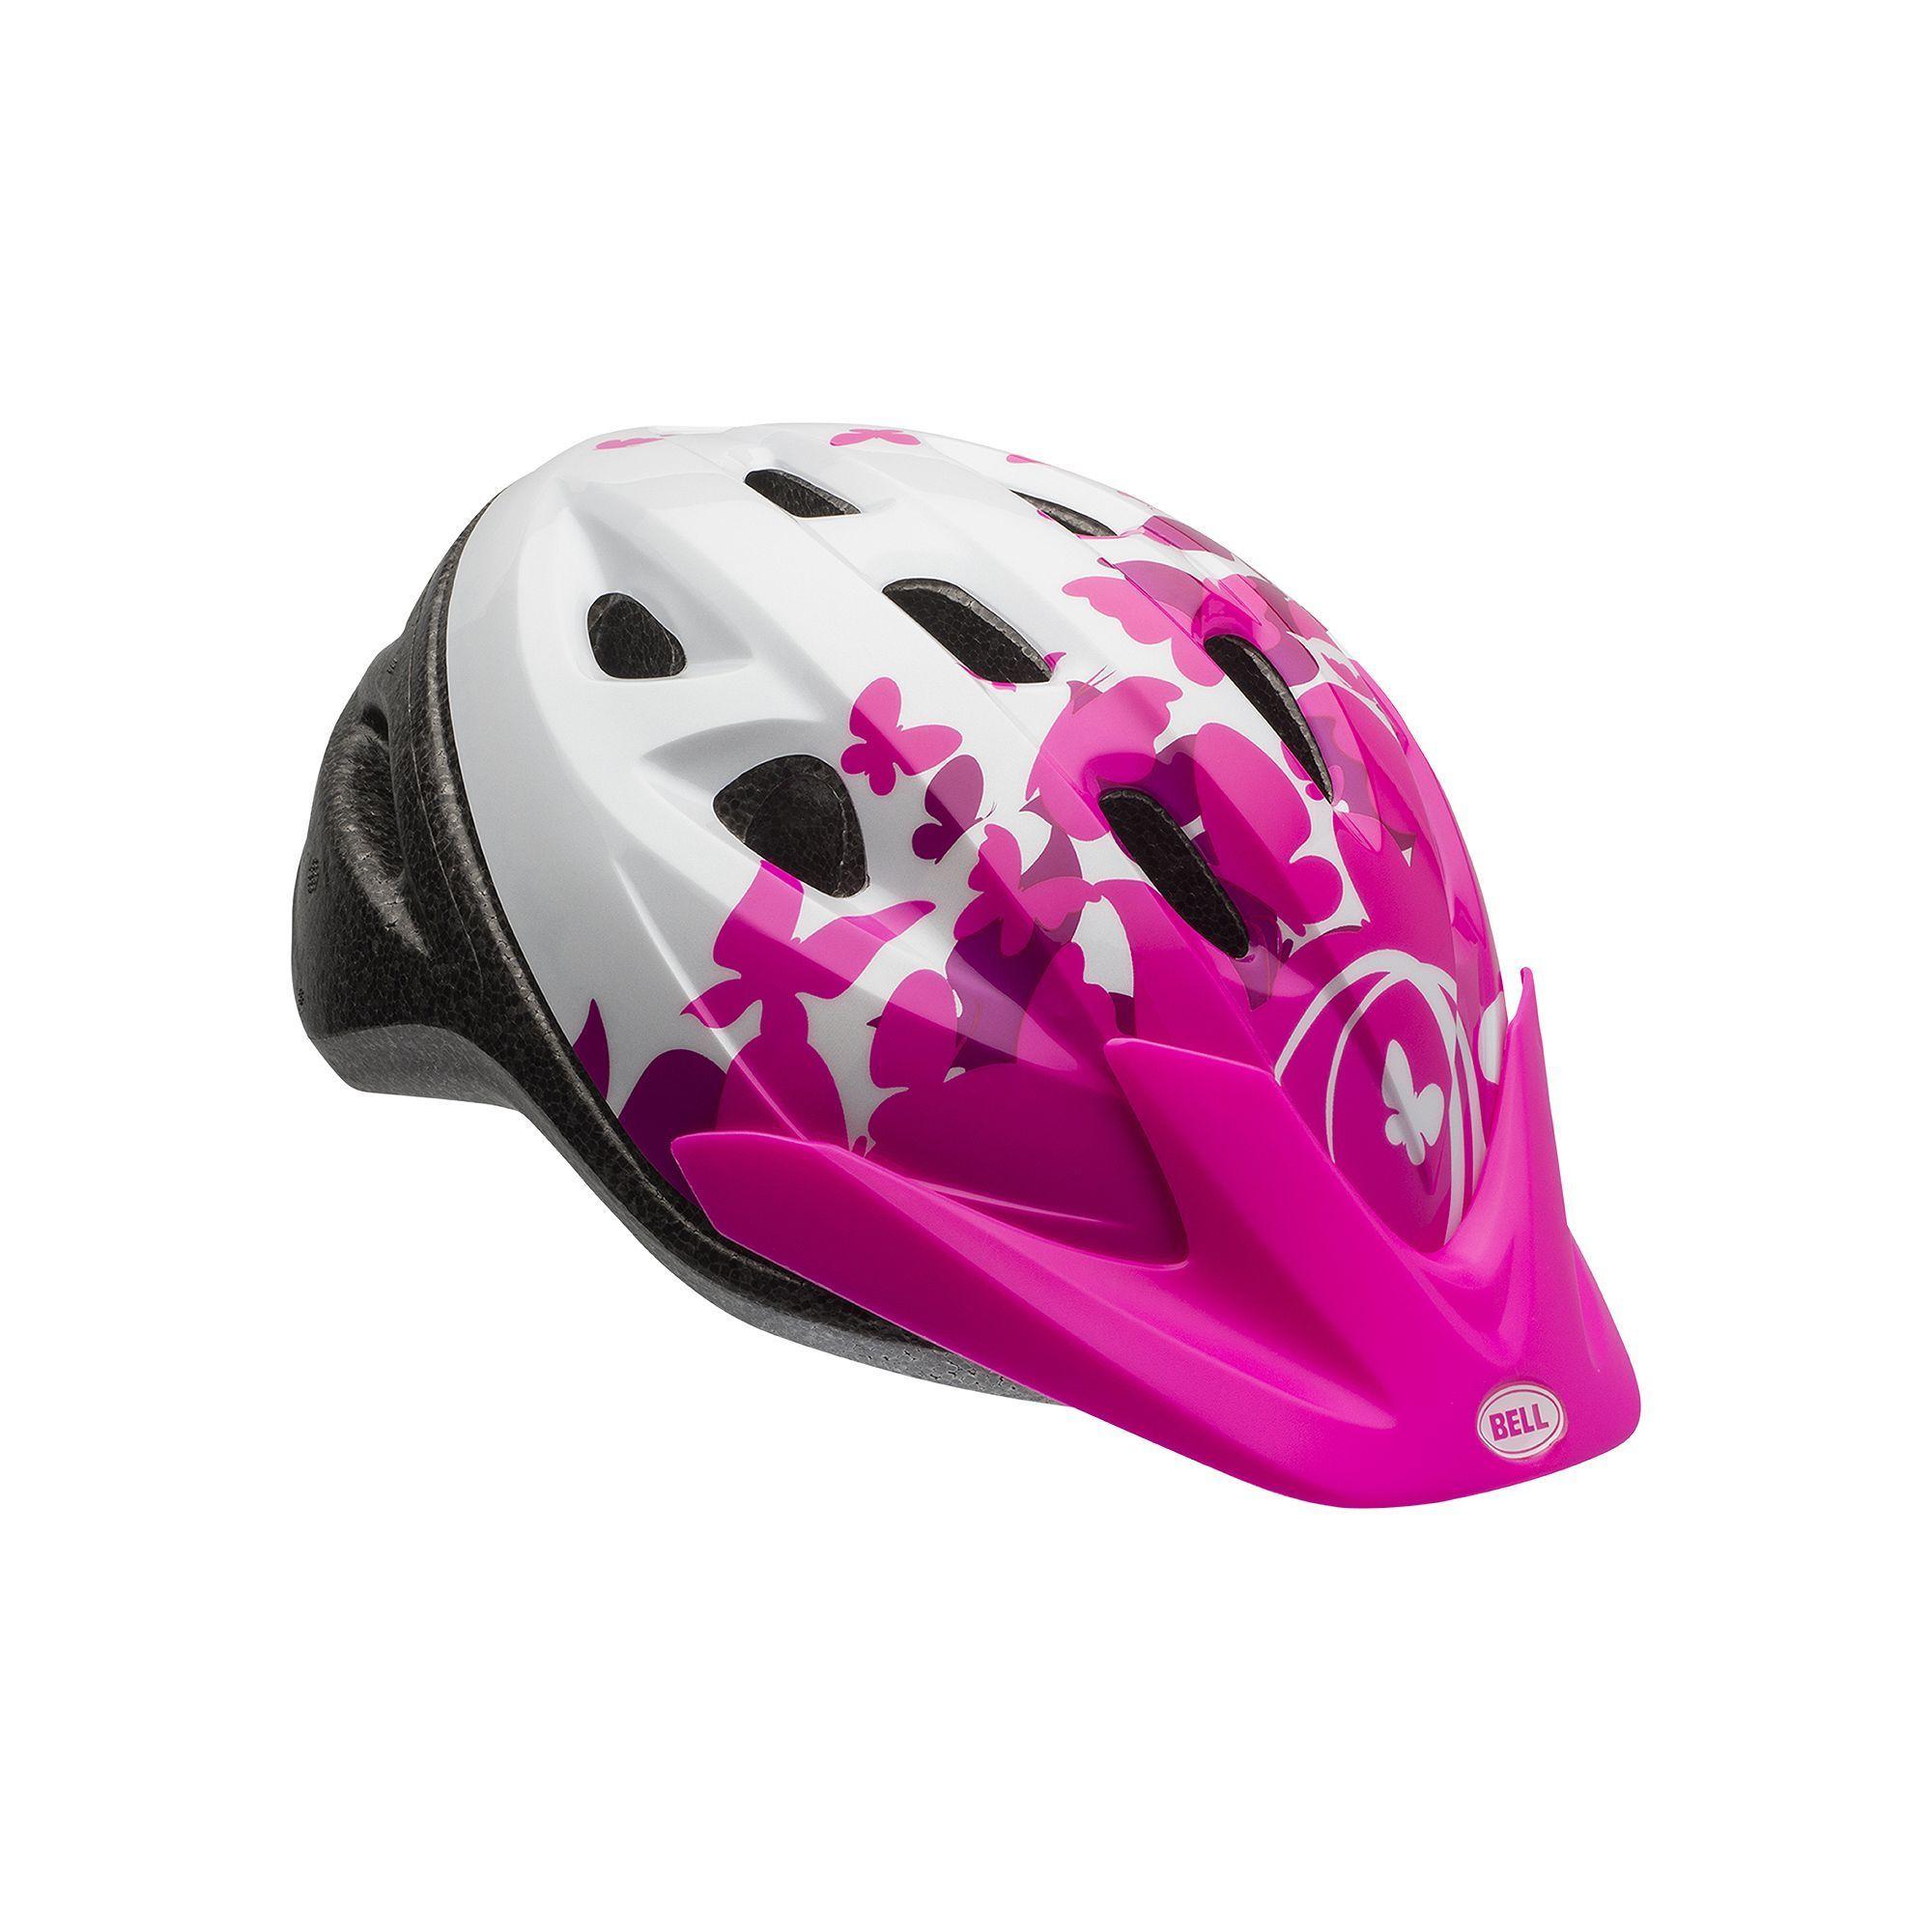 Youth Bell Rally True Fit Bike Helmet, Pink